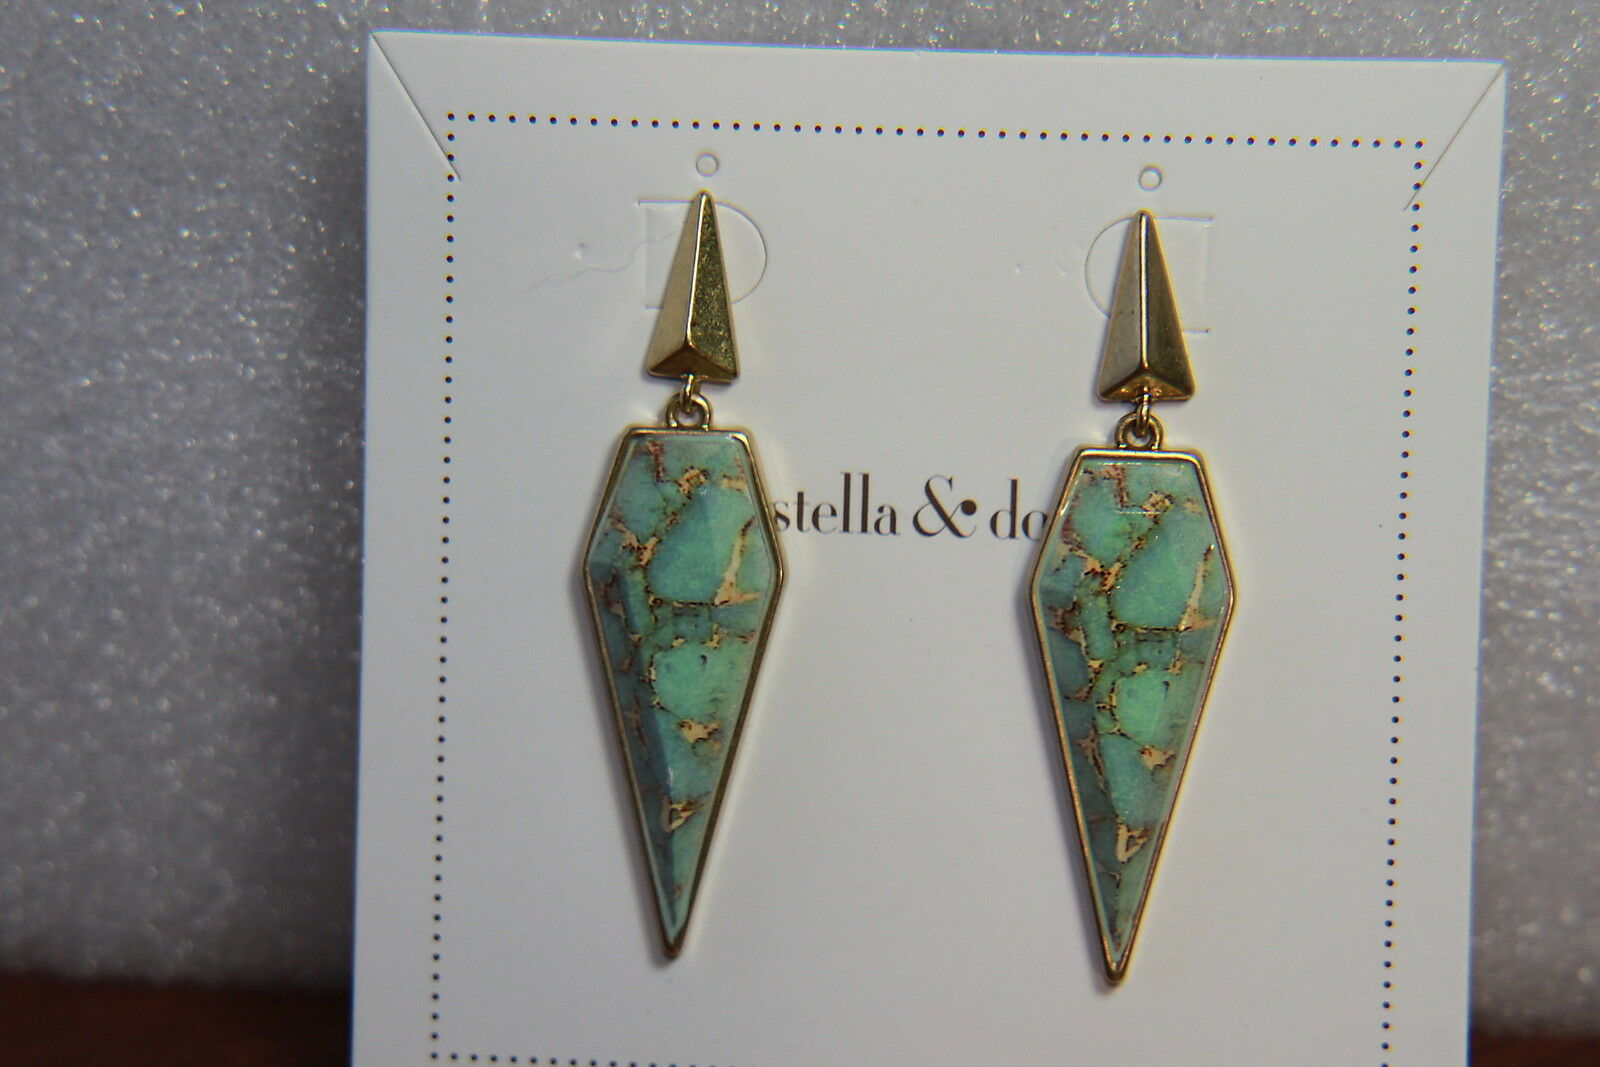 Stella & Dot Earrings (new) WINONA DROPS gold (E446G)